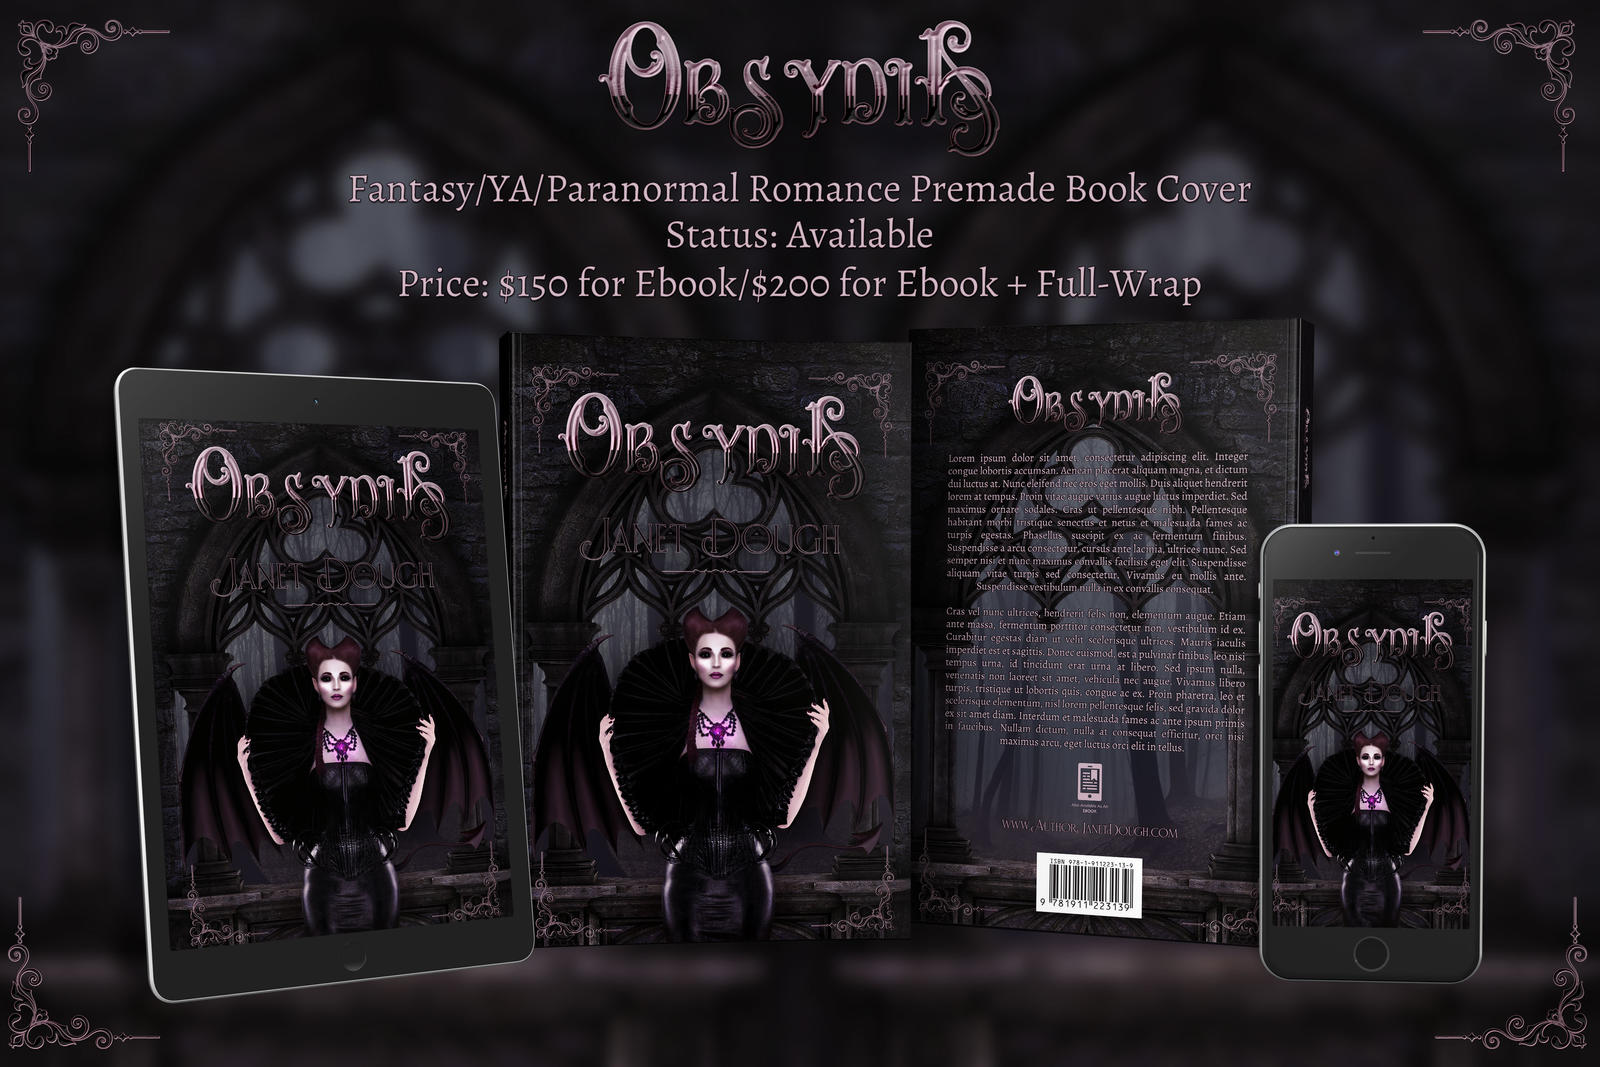 Obsydia - Dark Fantasy/Paranormal Romance 3D Mock